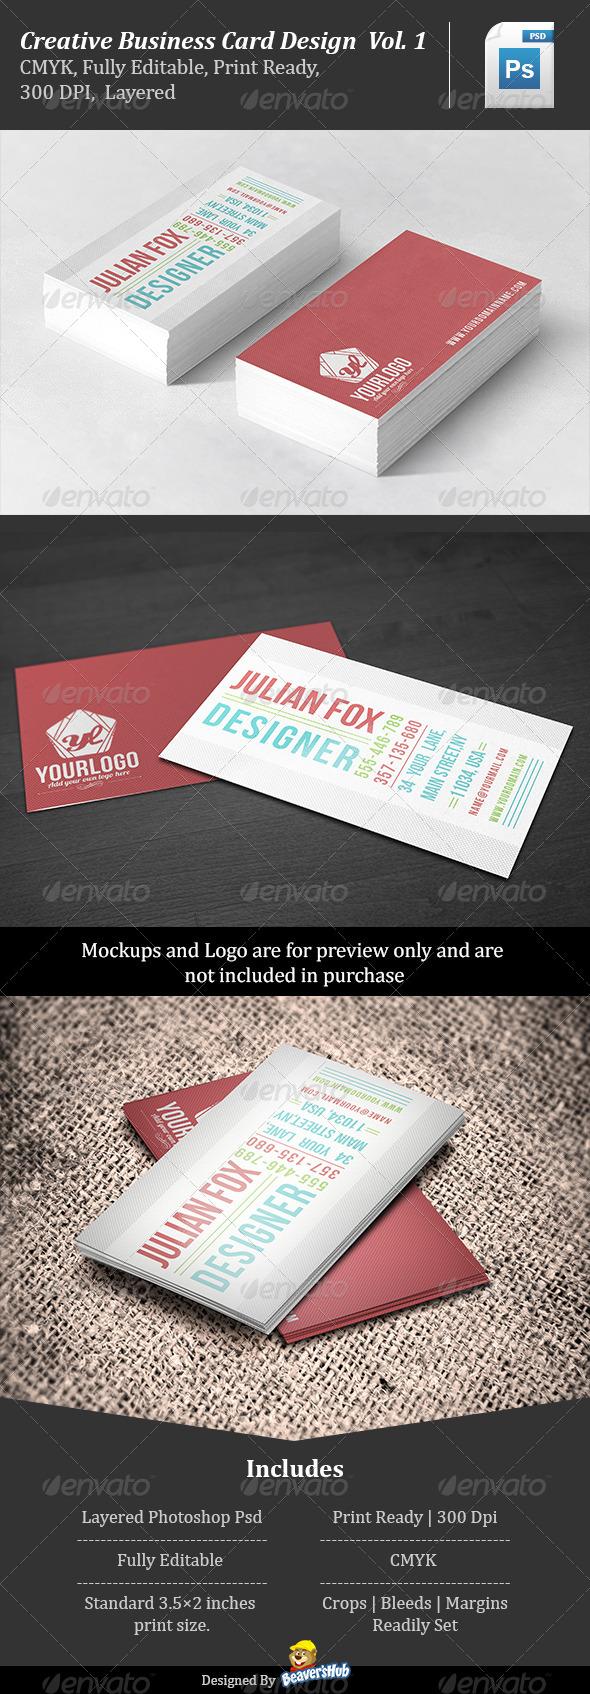 Creative Business Card Design Vol.1 - Creative Business Cards